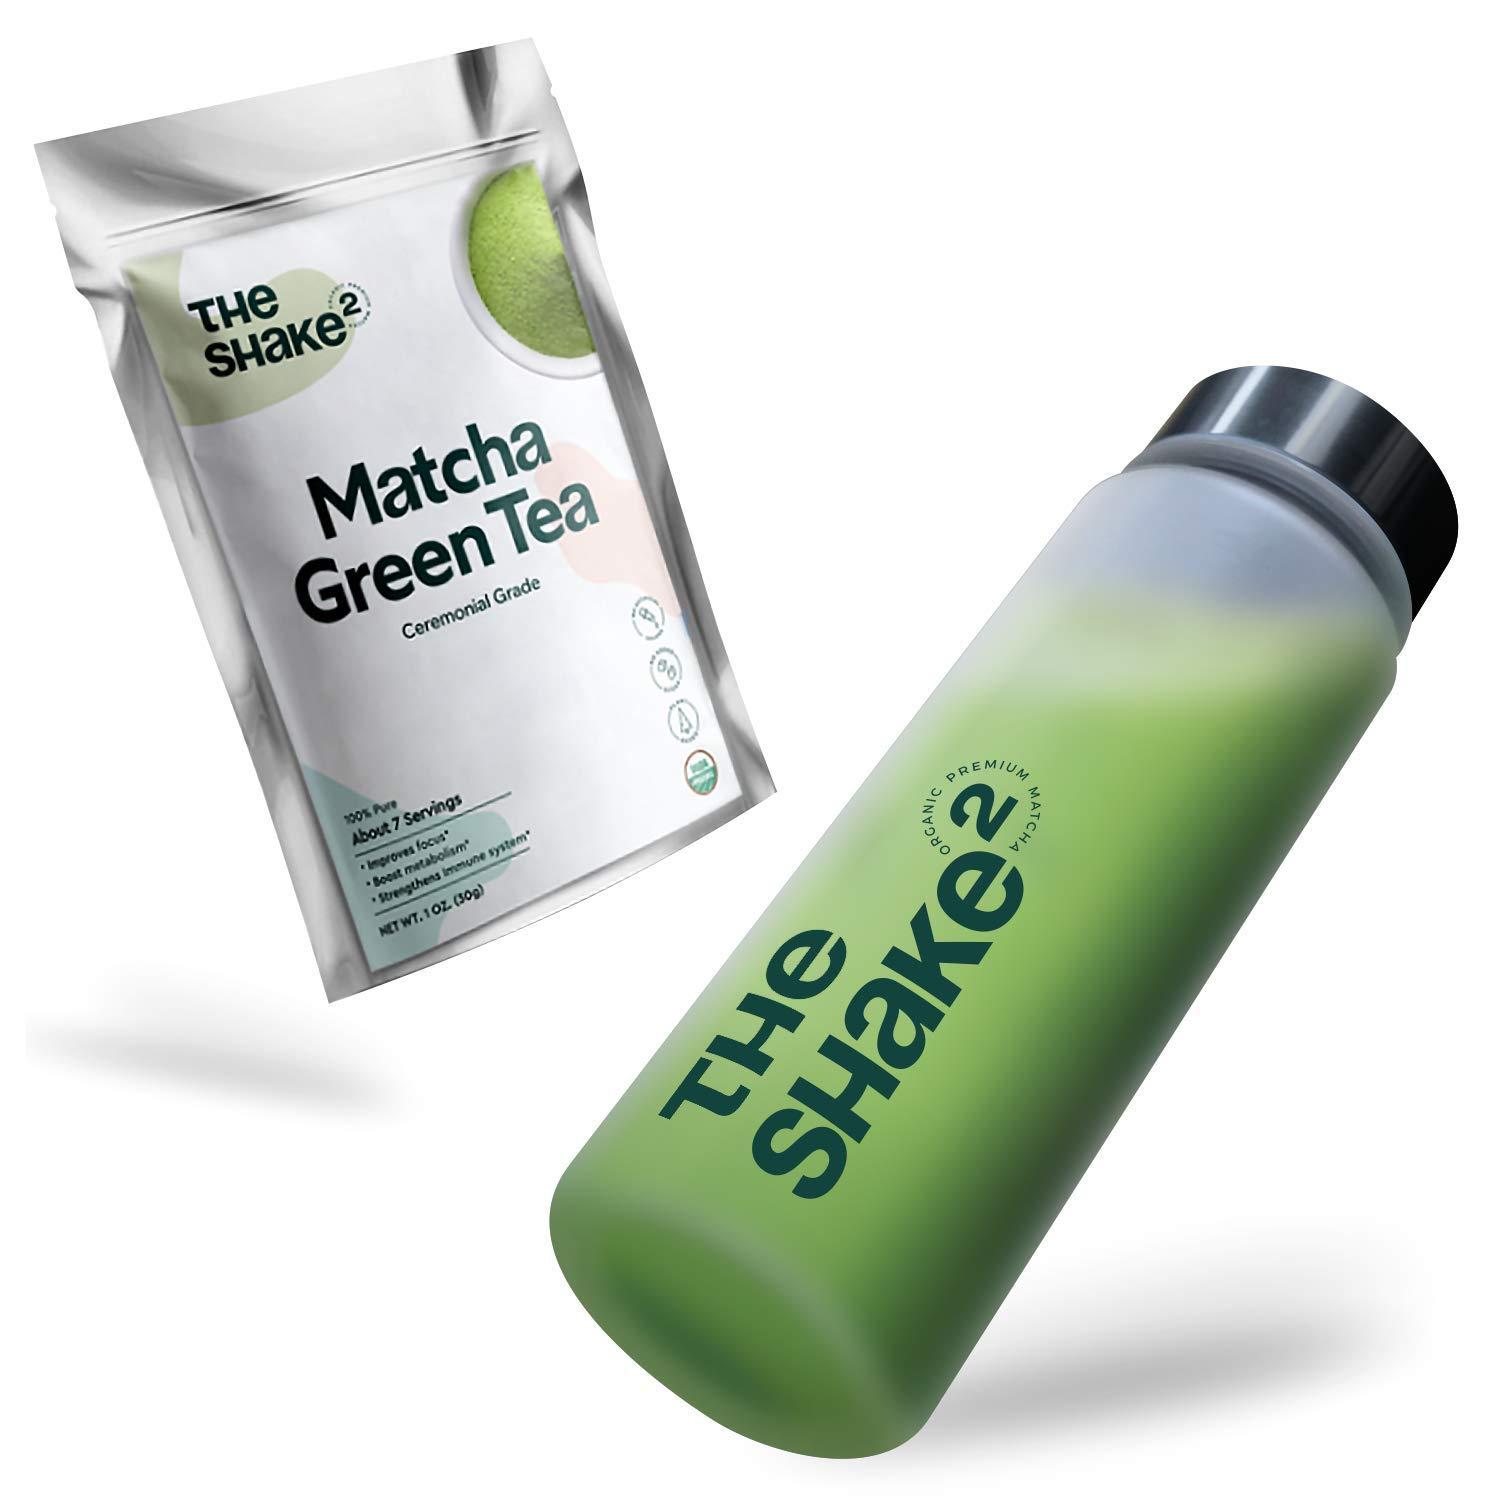 The Shake2 Matcha Green Tea Set- Premium First Harvest Ceremonial Grade, Japanese Blend from Kagoshima - Organic Powder with BPA Free Shaker Bottle - Made of Tritan Plastic - Antioxidant Rich - 30g